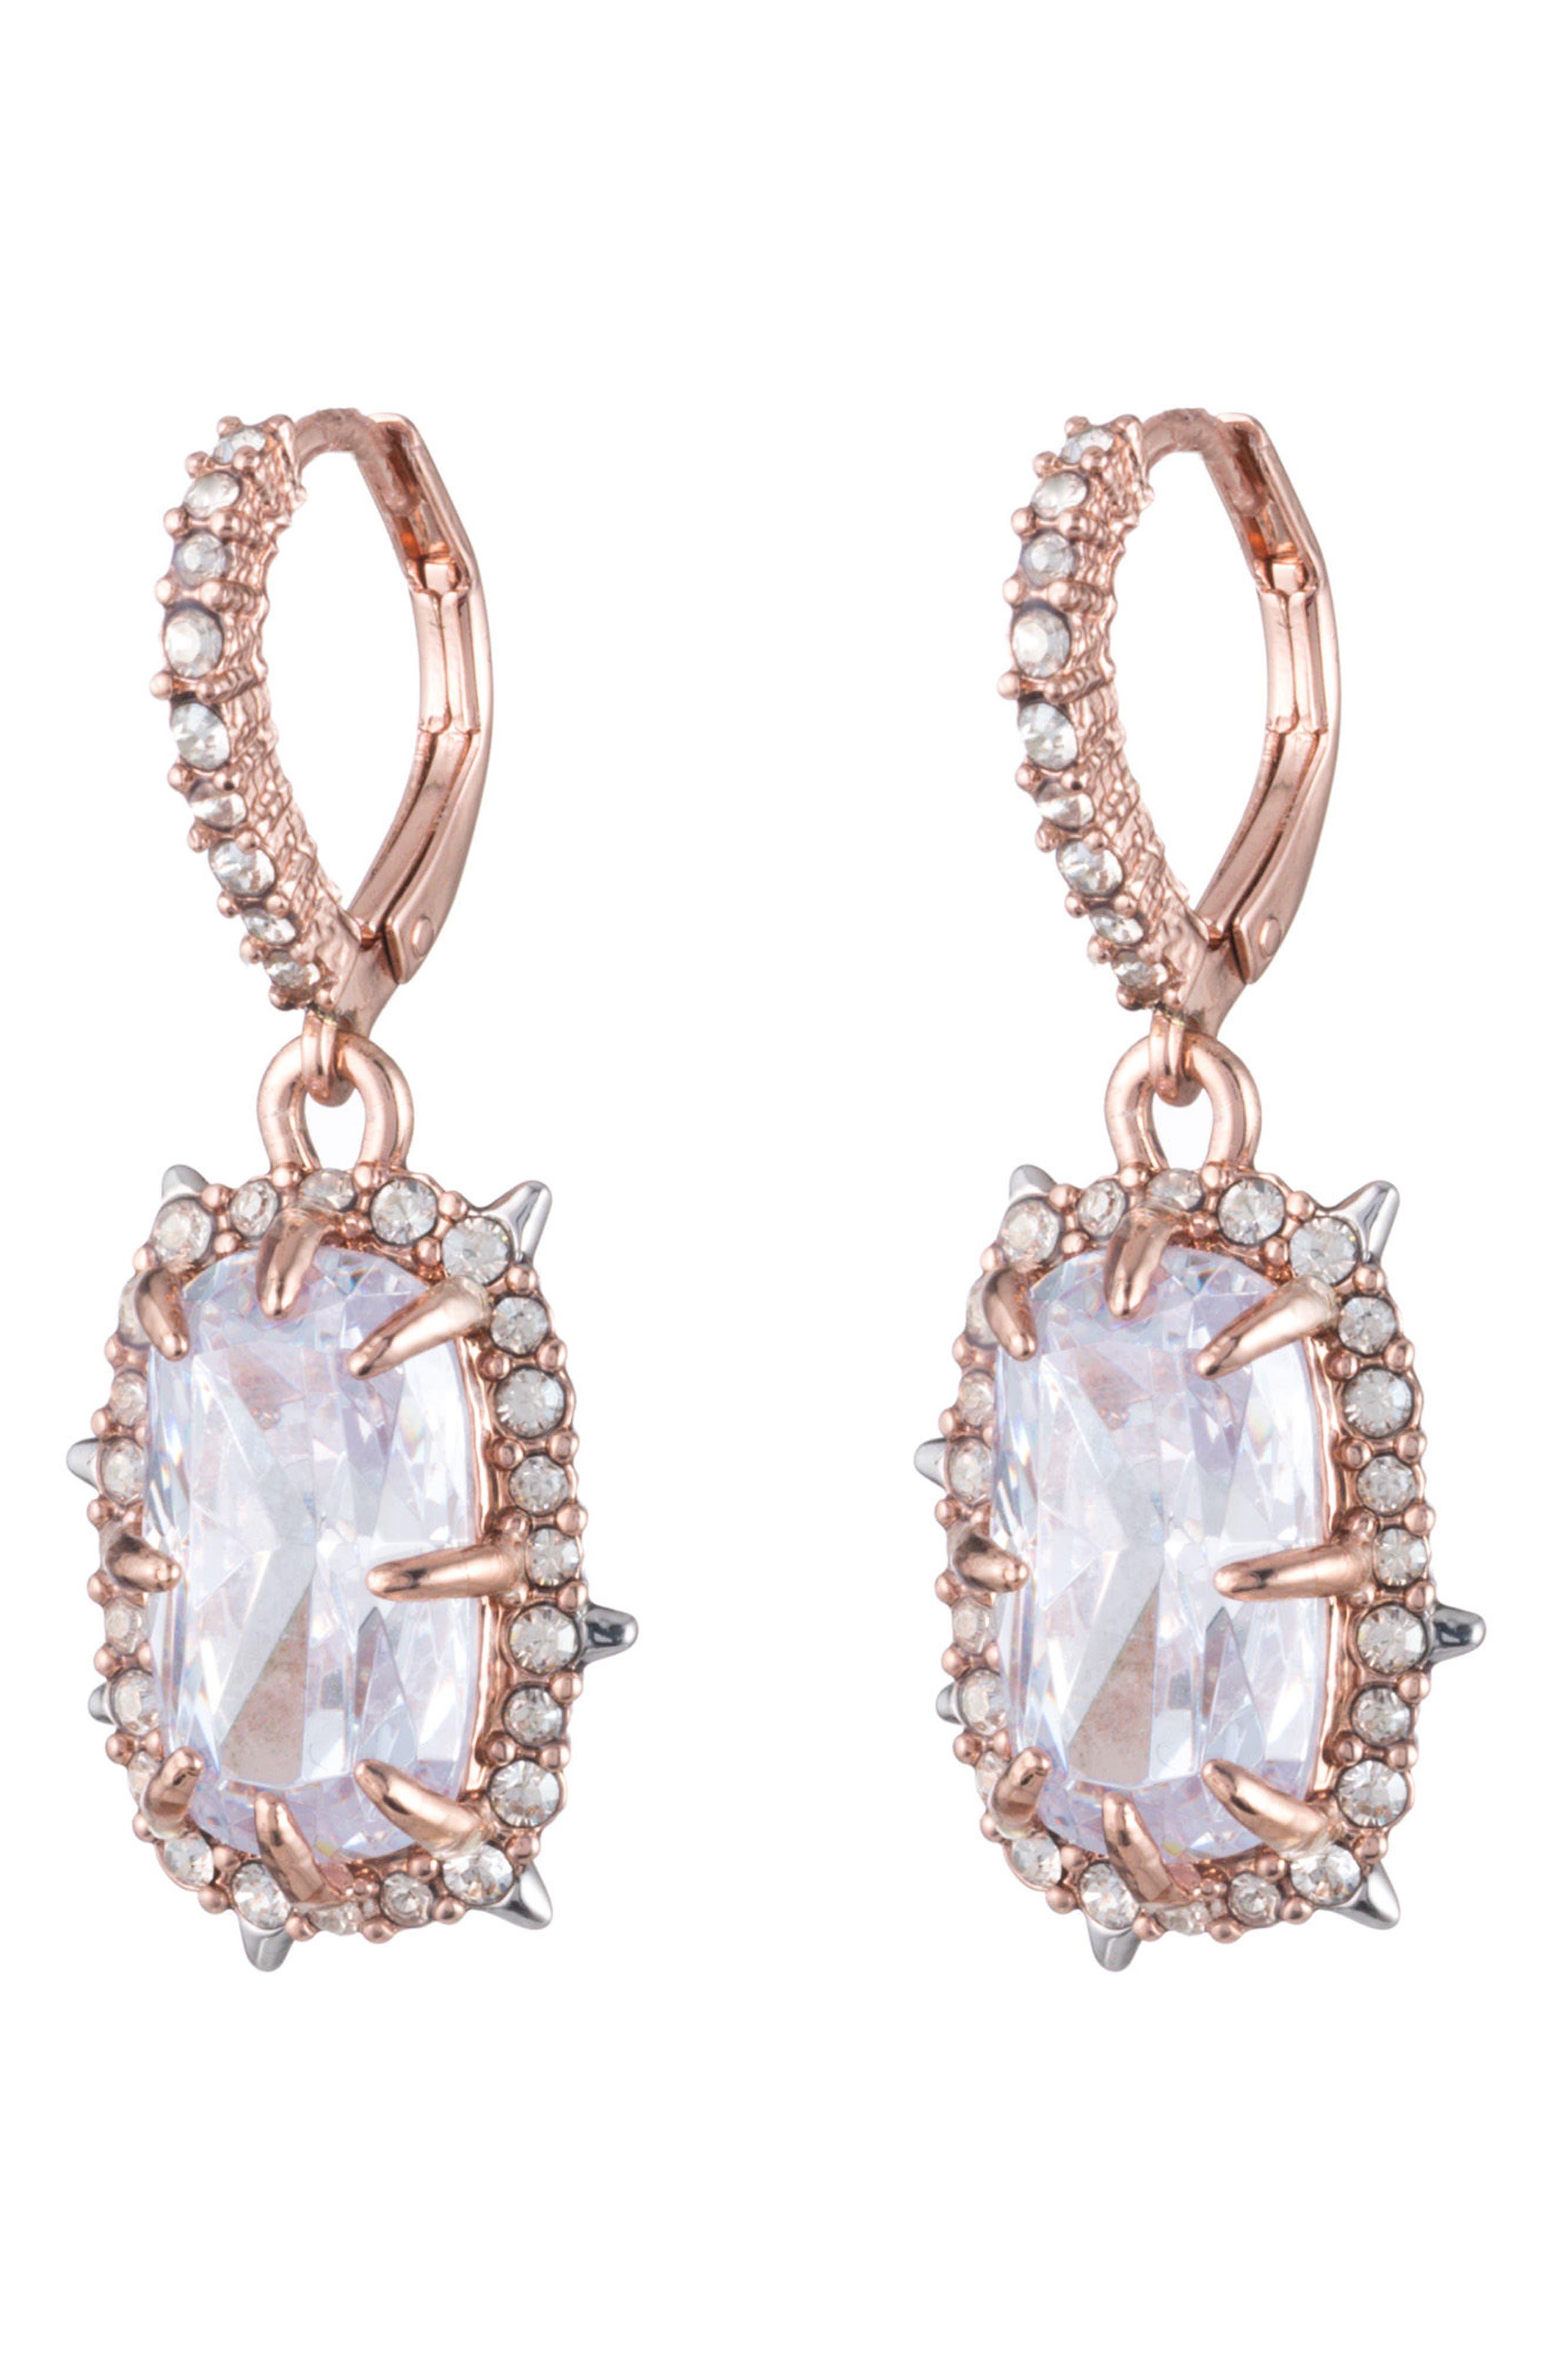 Crystal Drop Earrings,                             Main thumbnail 1, color,                             Rose Gold